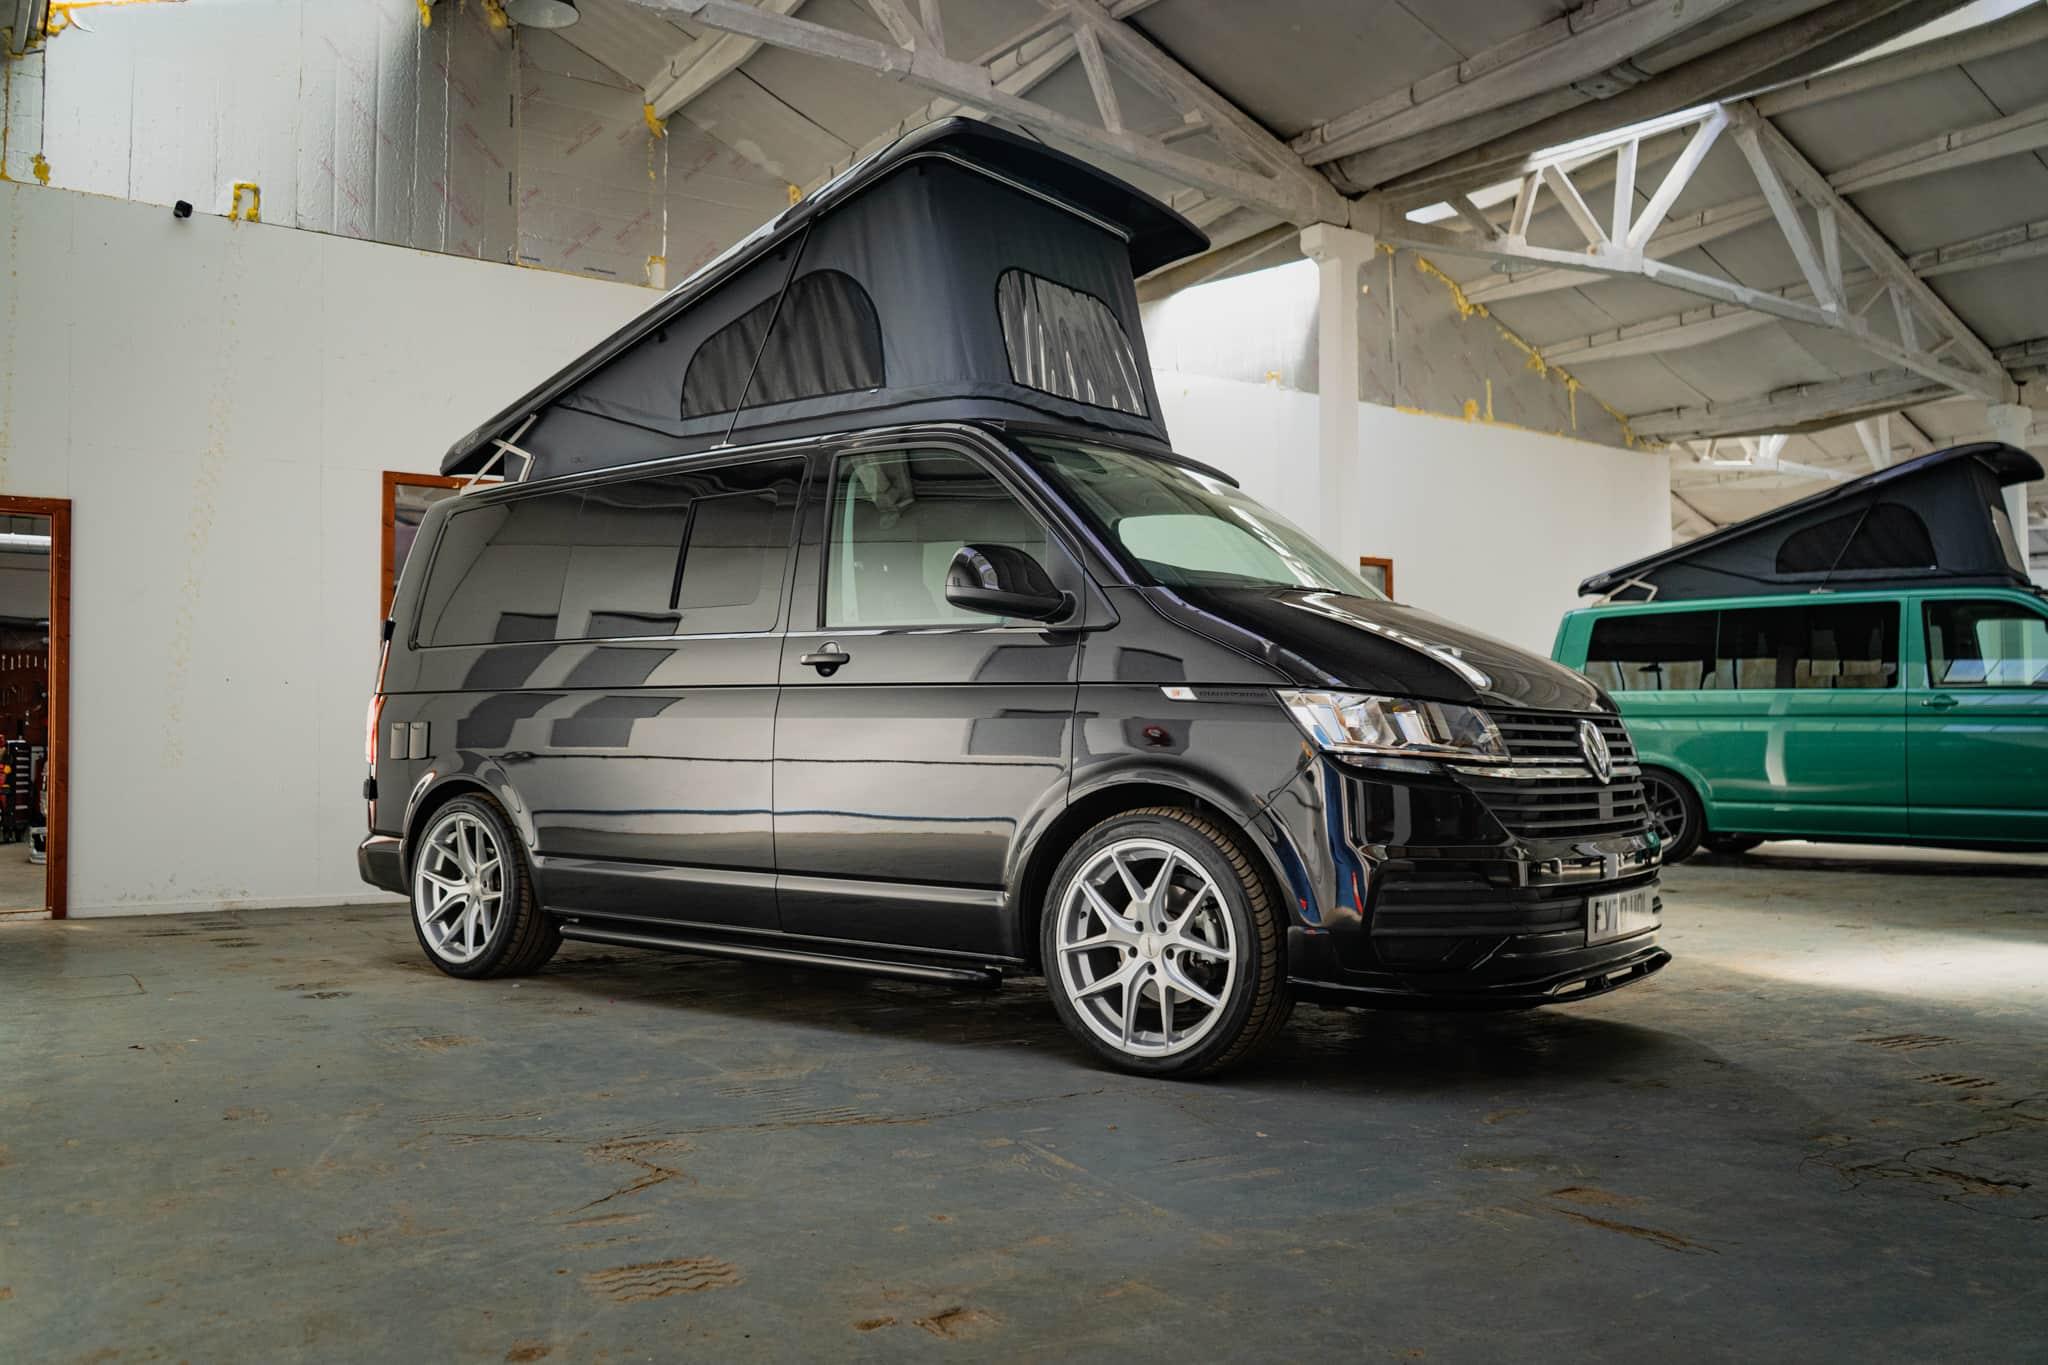 VW T6.1 Off Grid Camper with pop top roof - 21st June